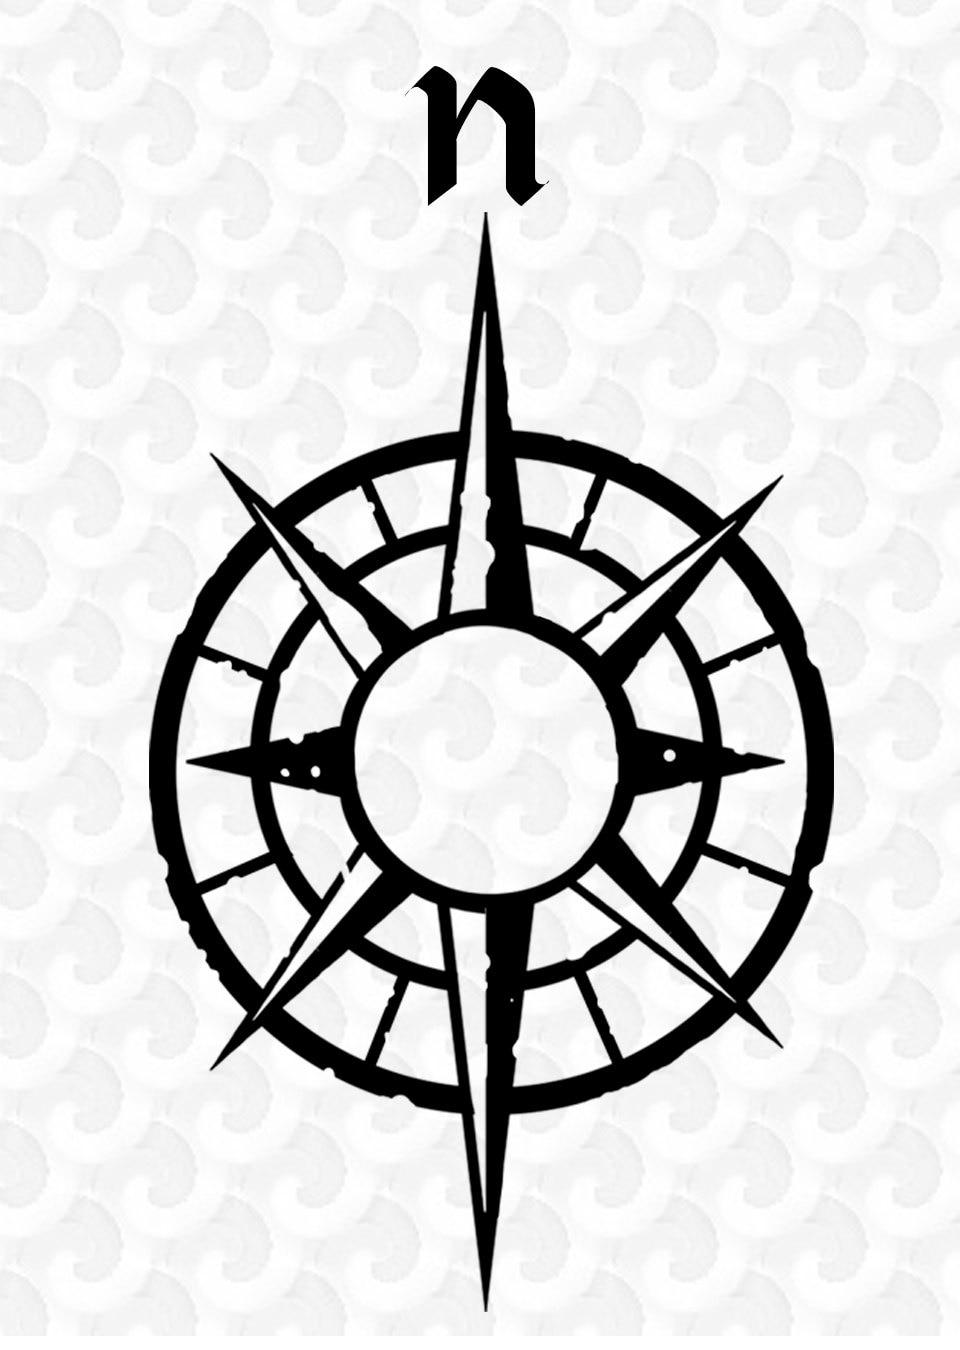 clip art map compass clip art silhouette png graphics instant rh etsystudio com clip art compression stockings clip art compass directions